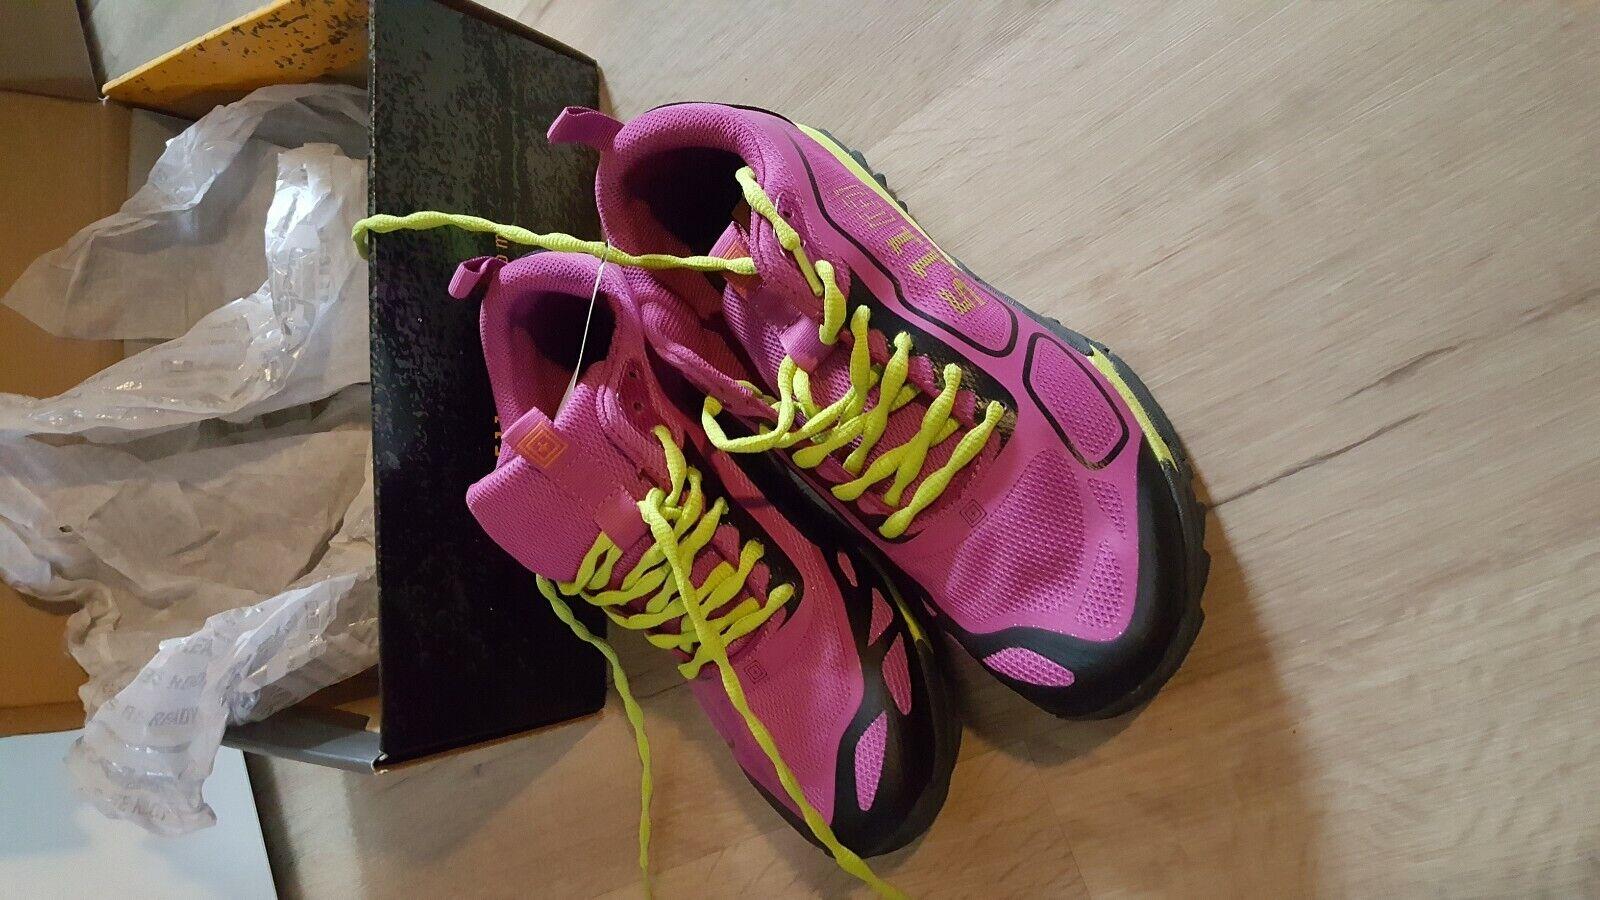 Turnschuhe Schuhe Fitness 5.11 Tactical DaSie Fuchsia Schnürung 40 Neu